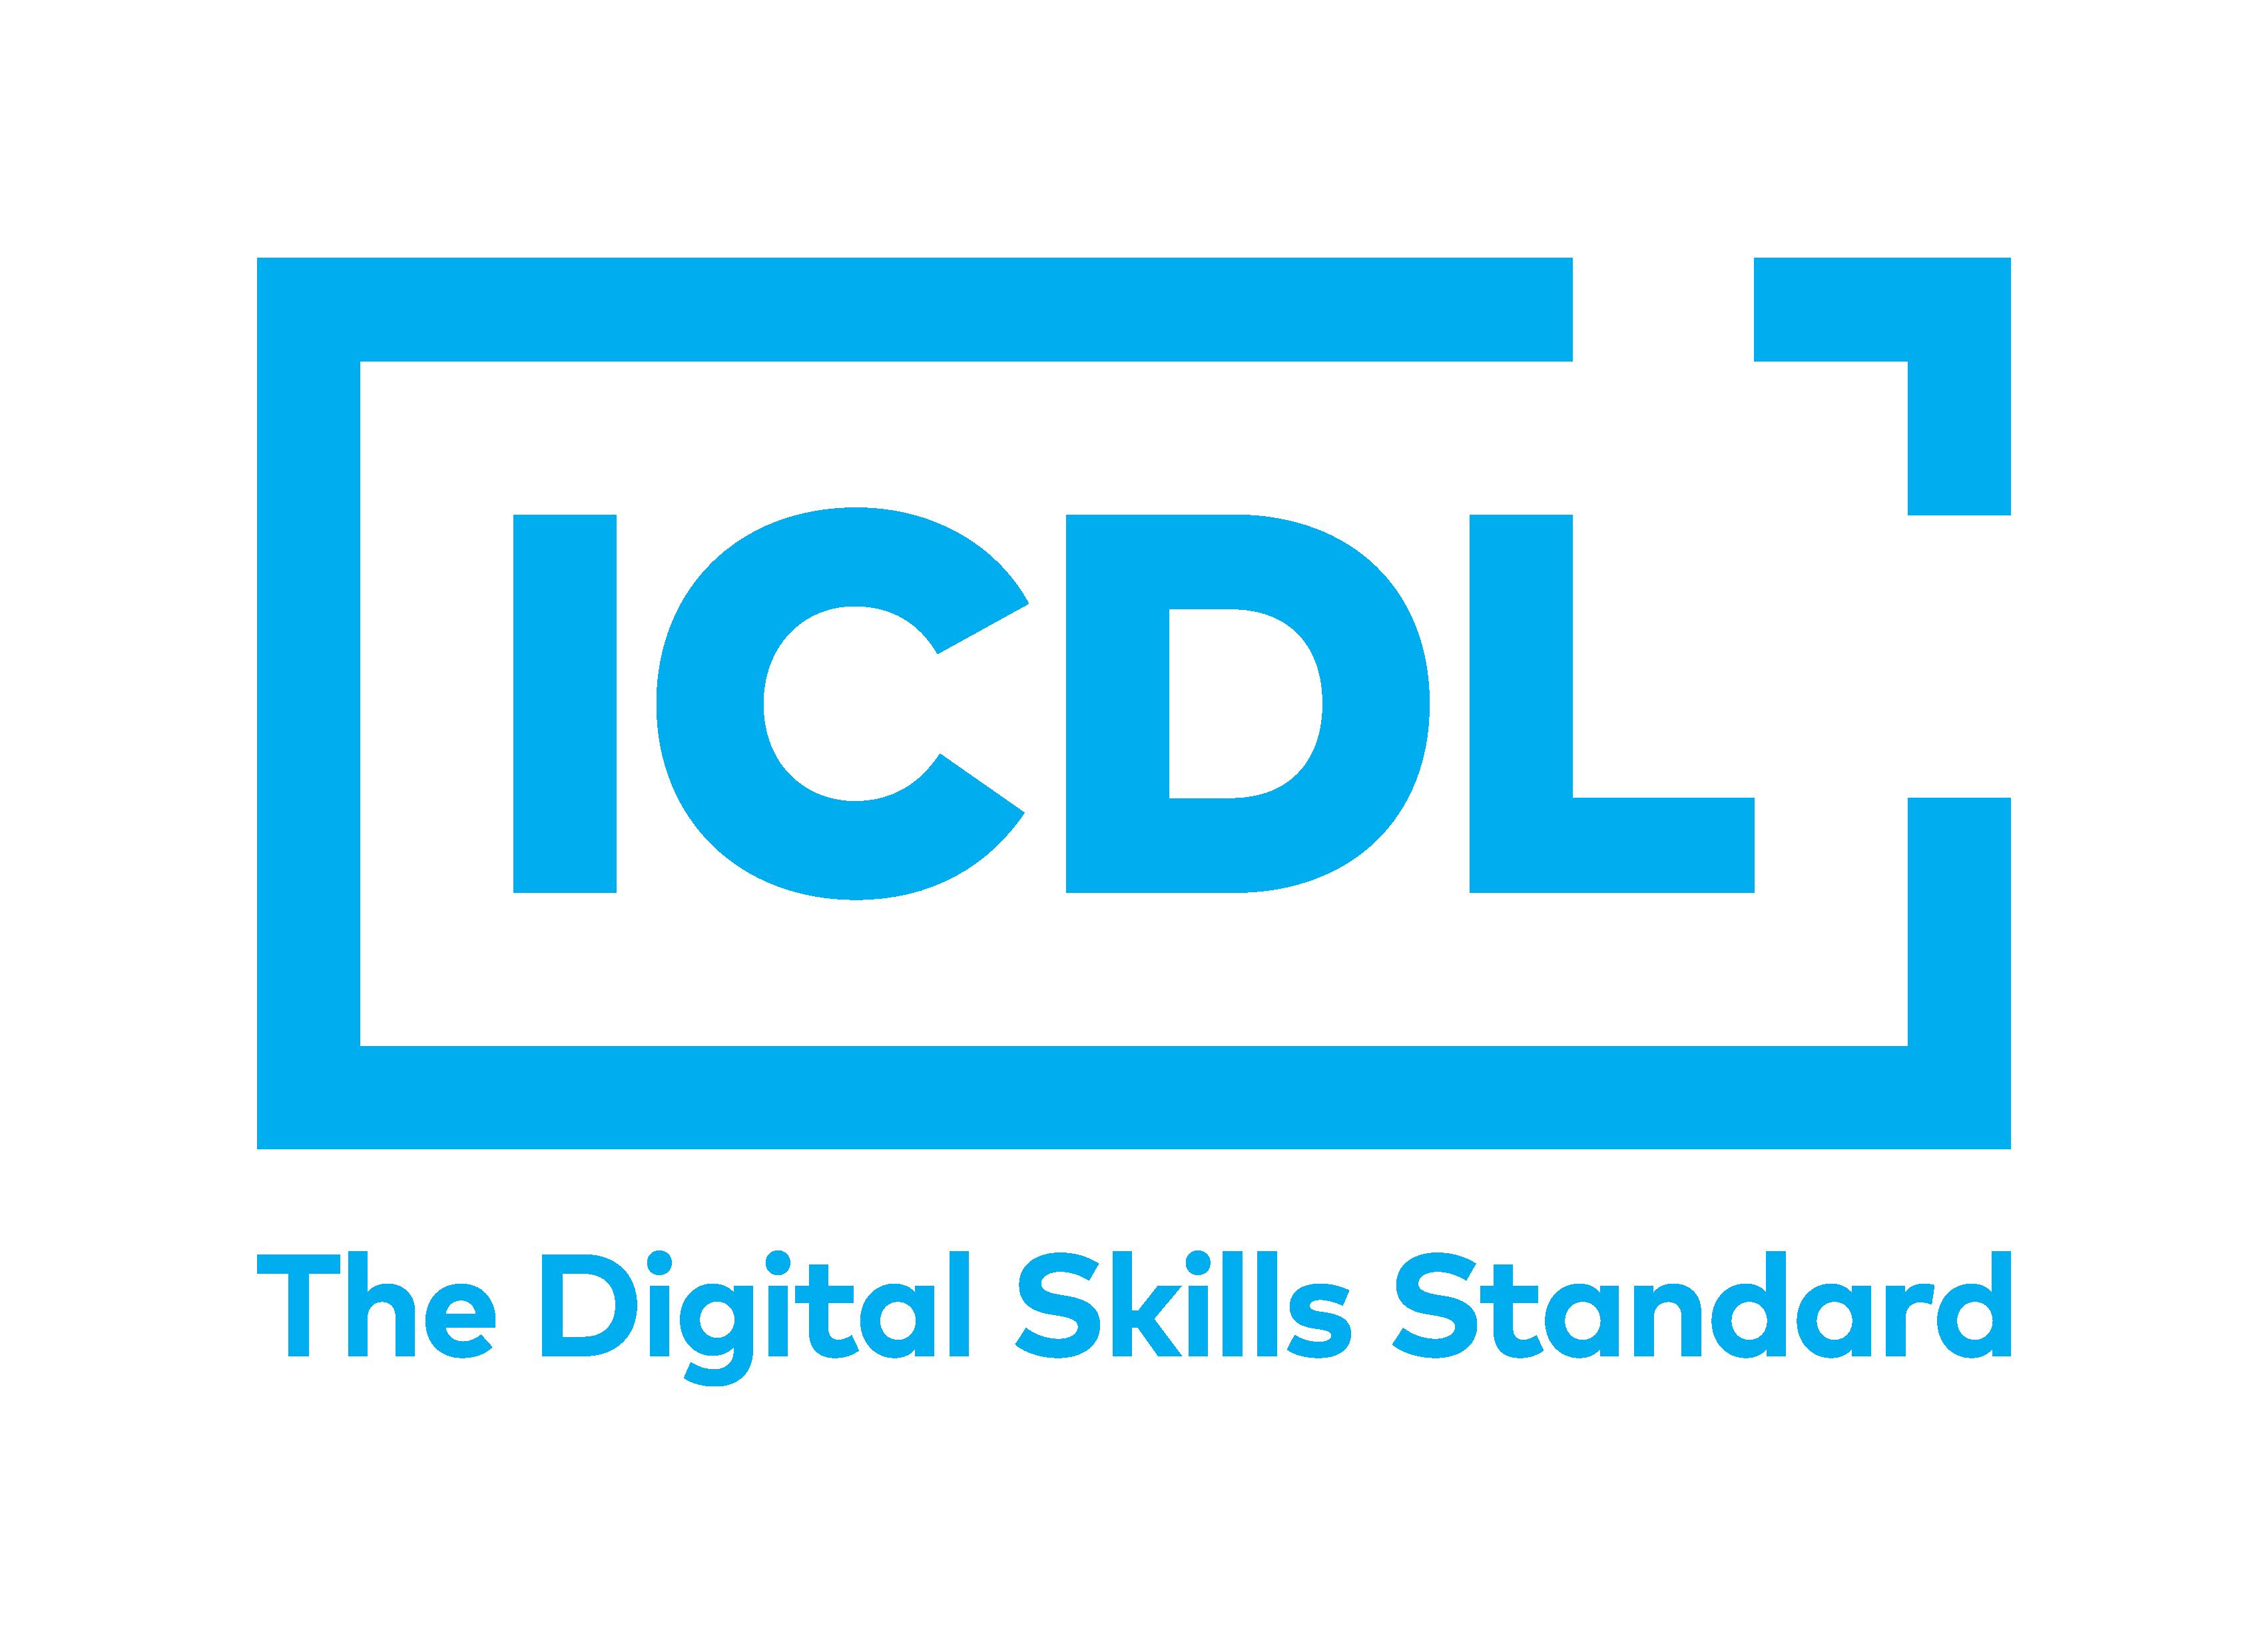 Logo ICDL officiel (avec transparence) en png